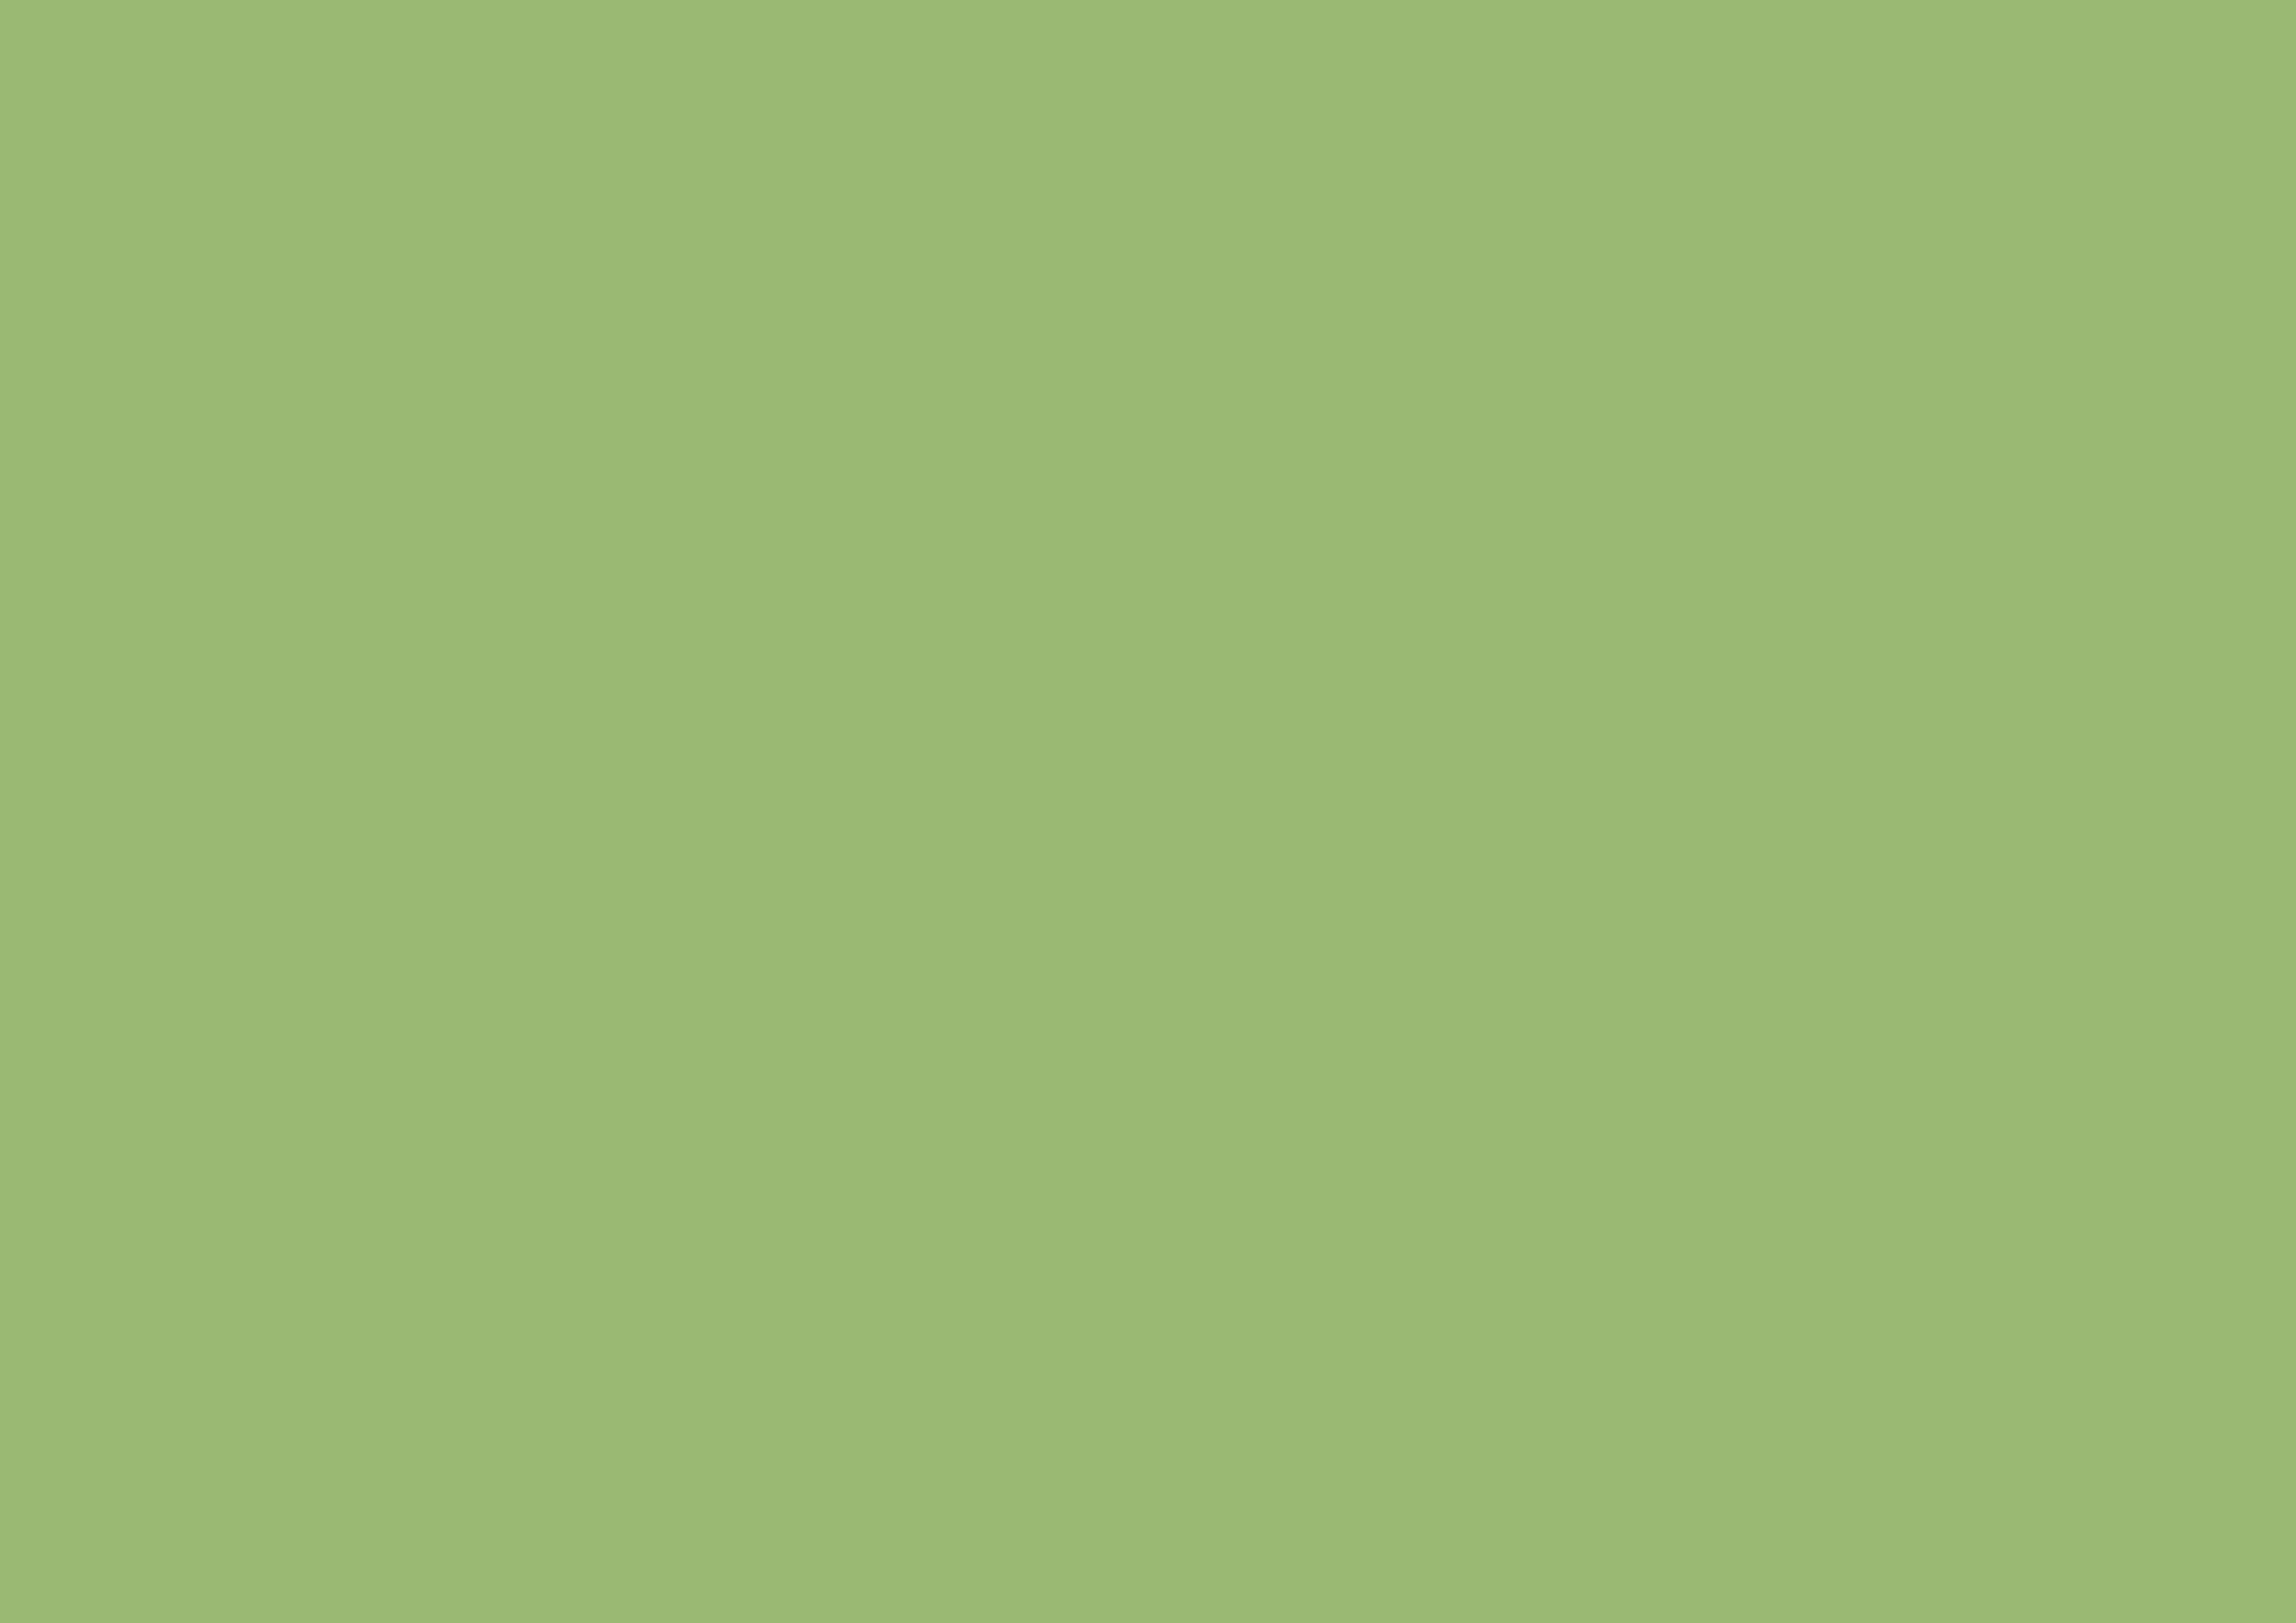 3508x2480 Olivine Solid Color Background